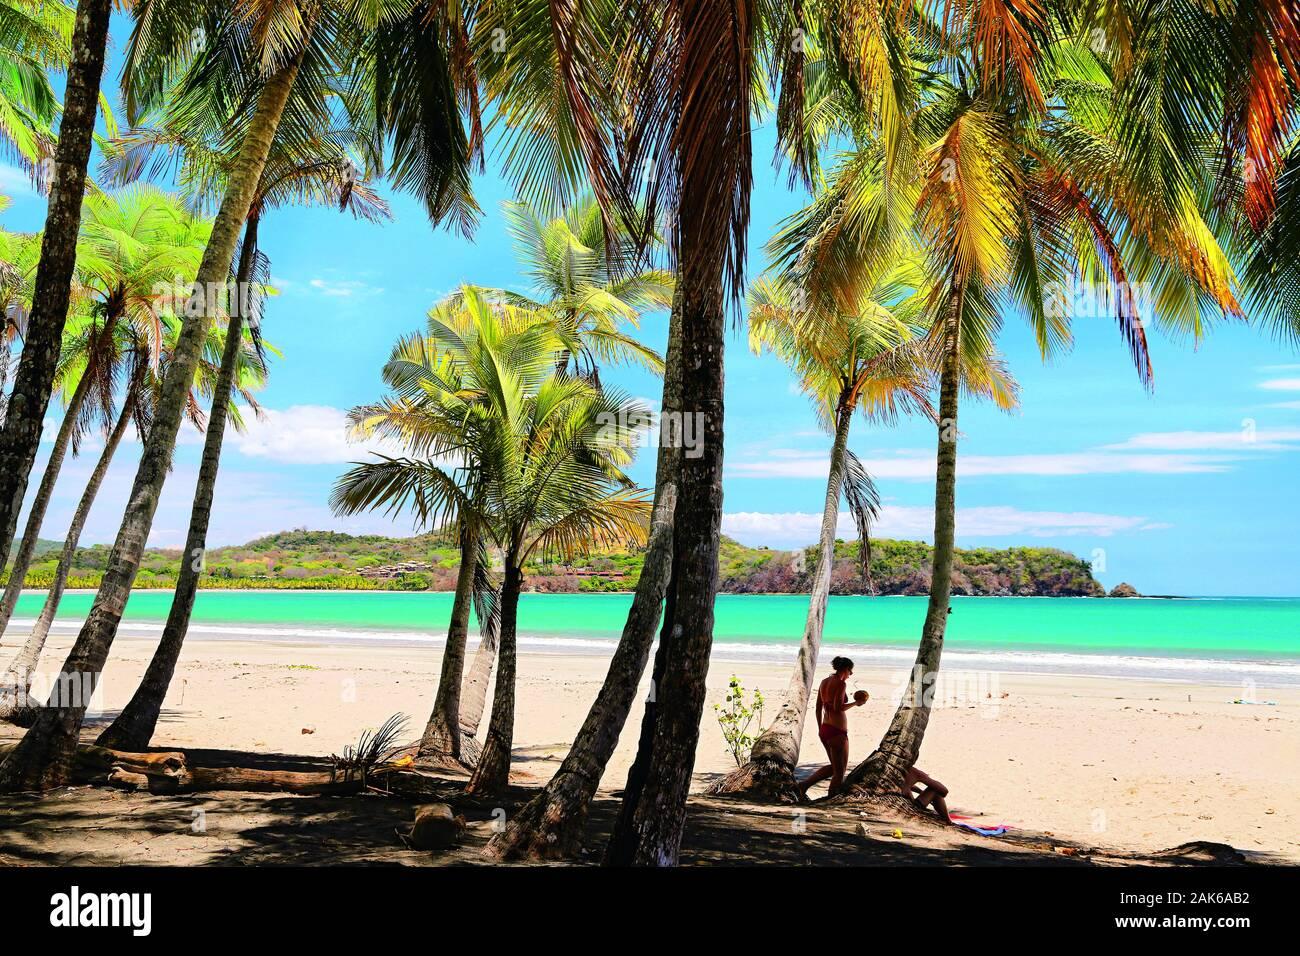 Guanacaste: Palmenstrand an der Playa Carillo, Costa Rica | usage worldwide Stock Photo